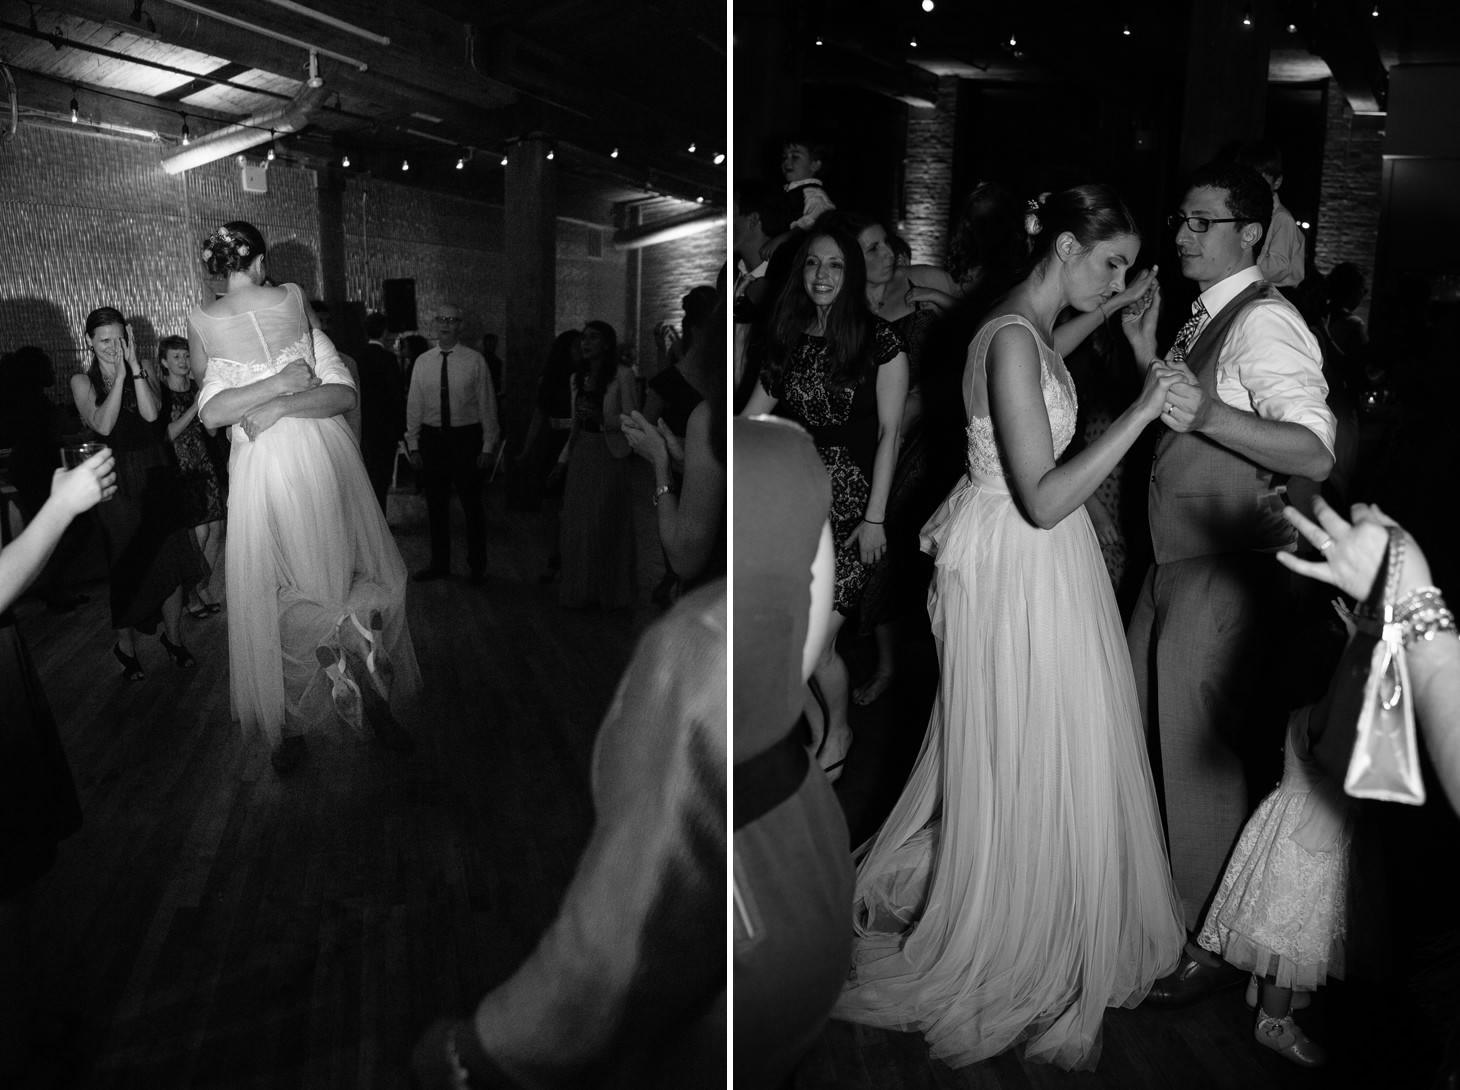 058-nyc-dumbo-loft-brooklyn-wedding-photographer-smitten-chickens-photo-.jpg